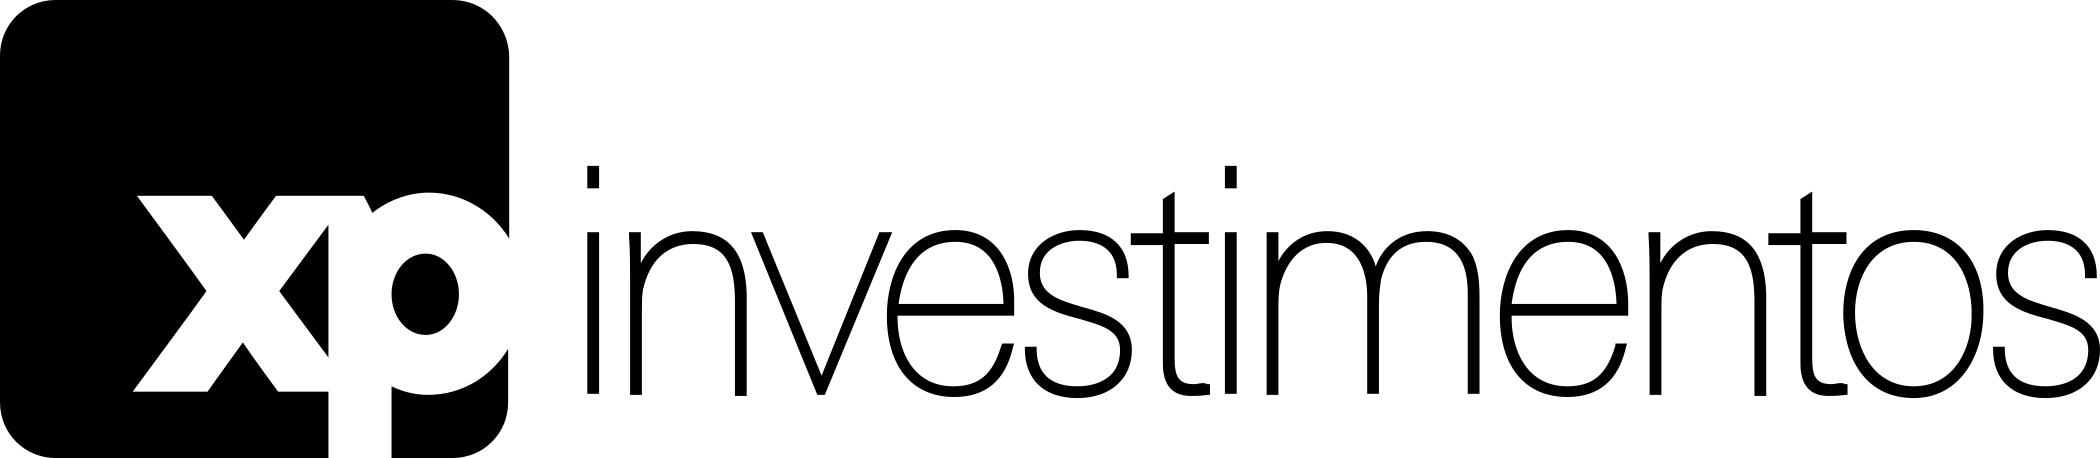 xp investimentos logo 1 - XP Investimentos Logo